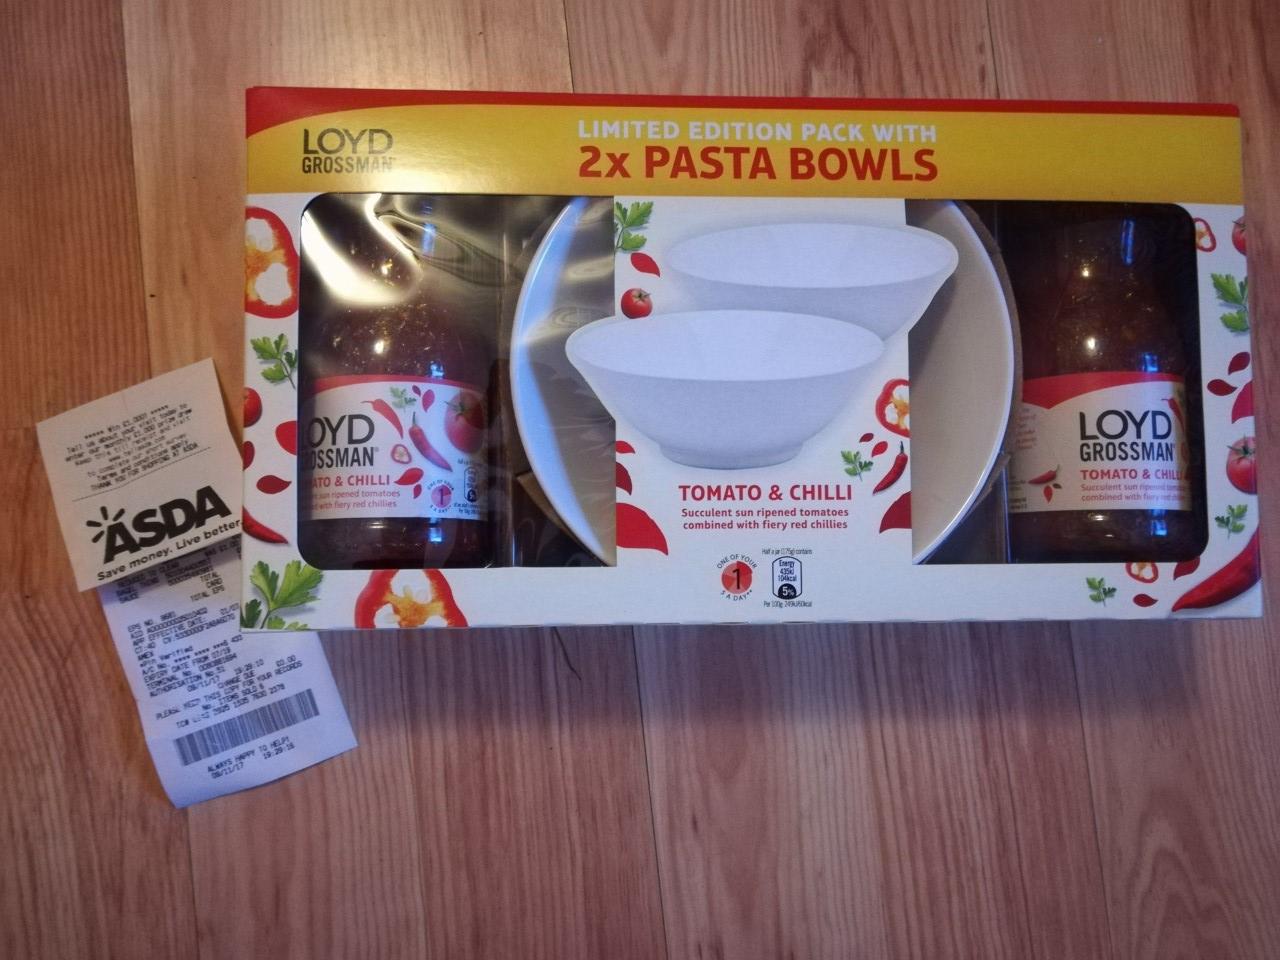 2 x Lloyd Grossman jars tomato & chilli + 2 pasta bowls instore @ Asda (Redditch) - £3